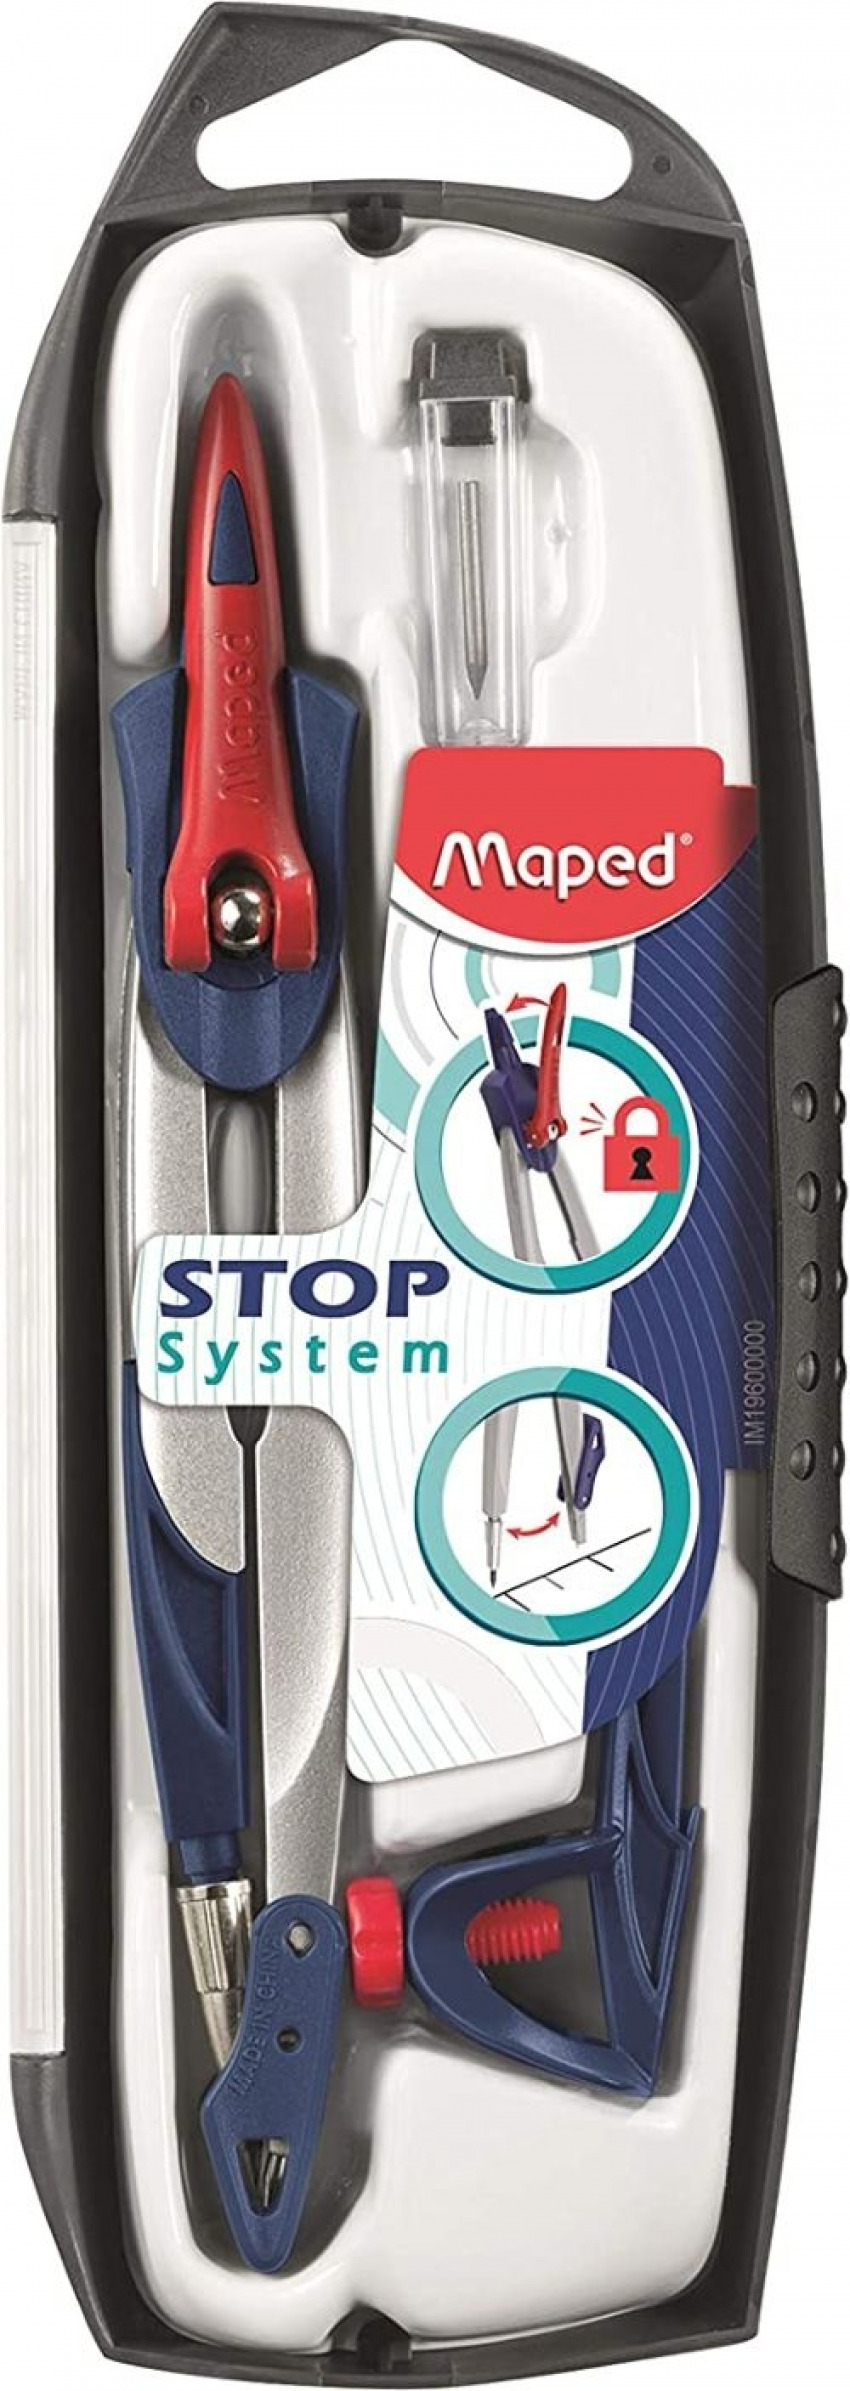 Exp 10 compases stop system con adaptador universal 1315414196102